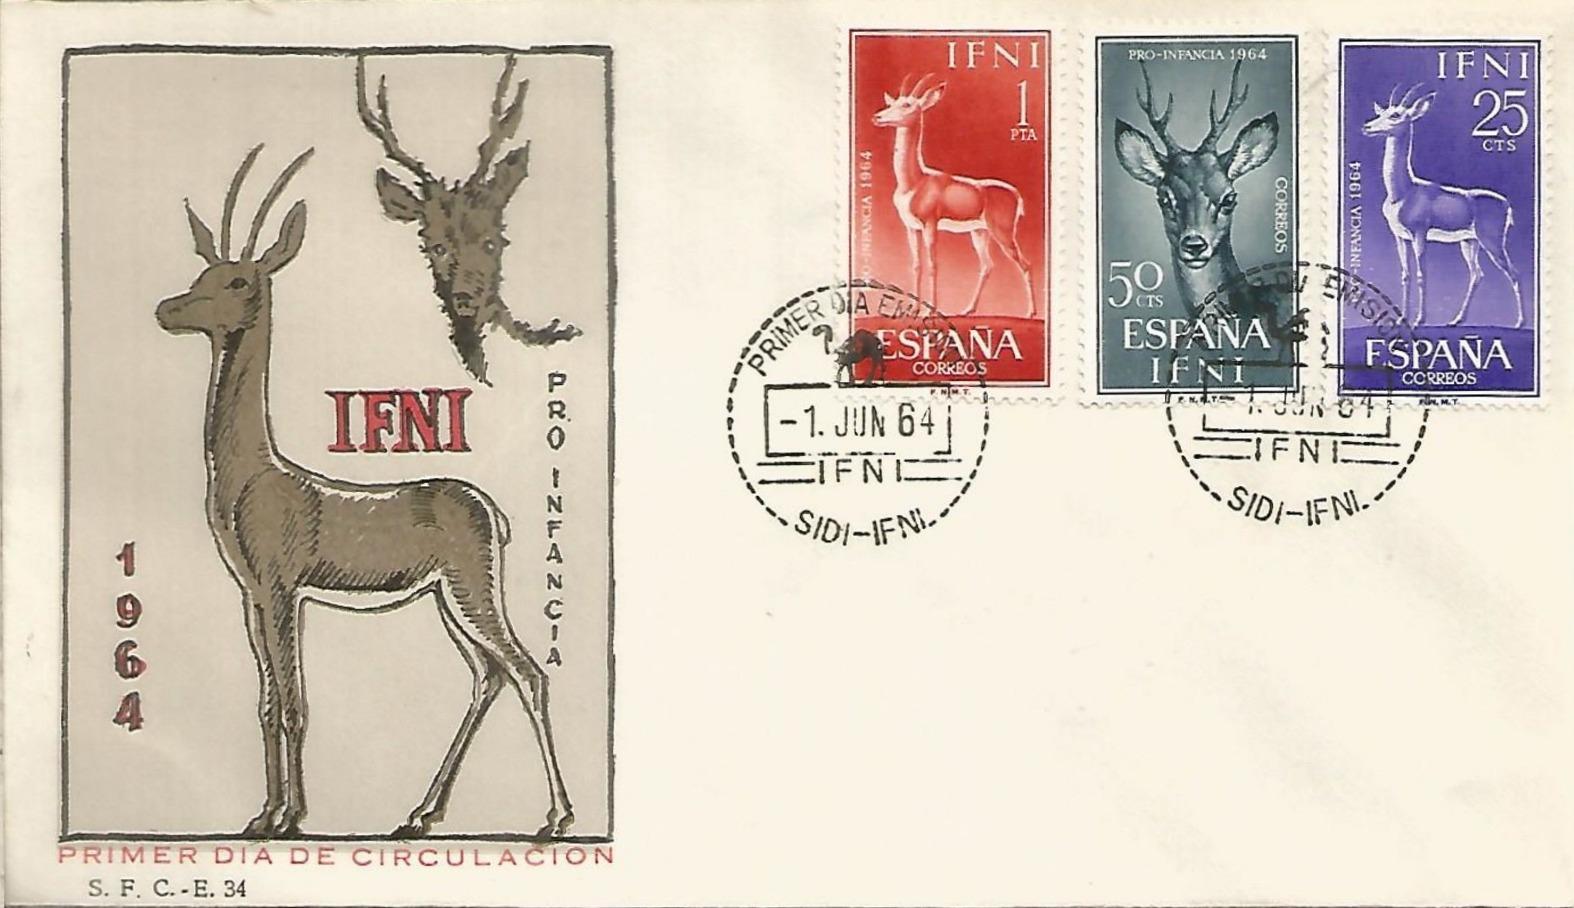 Ifni 1964 Child Welfare - Regular Stamps FDCa.jpg